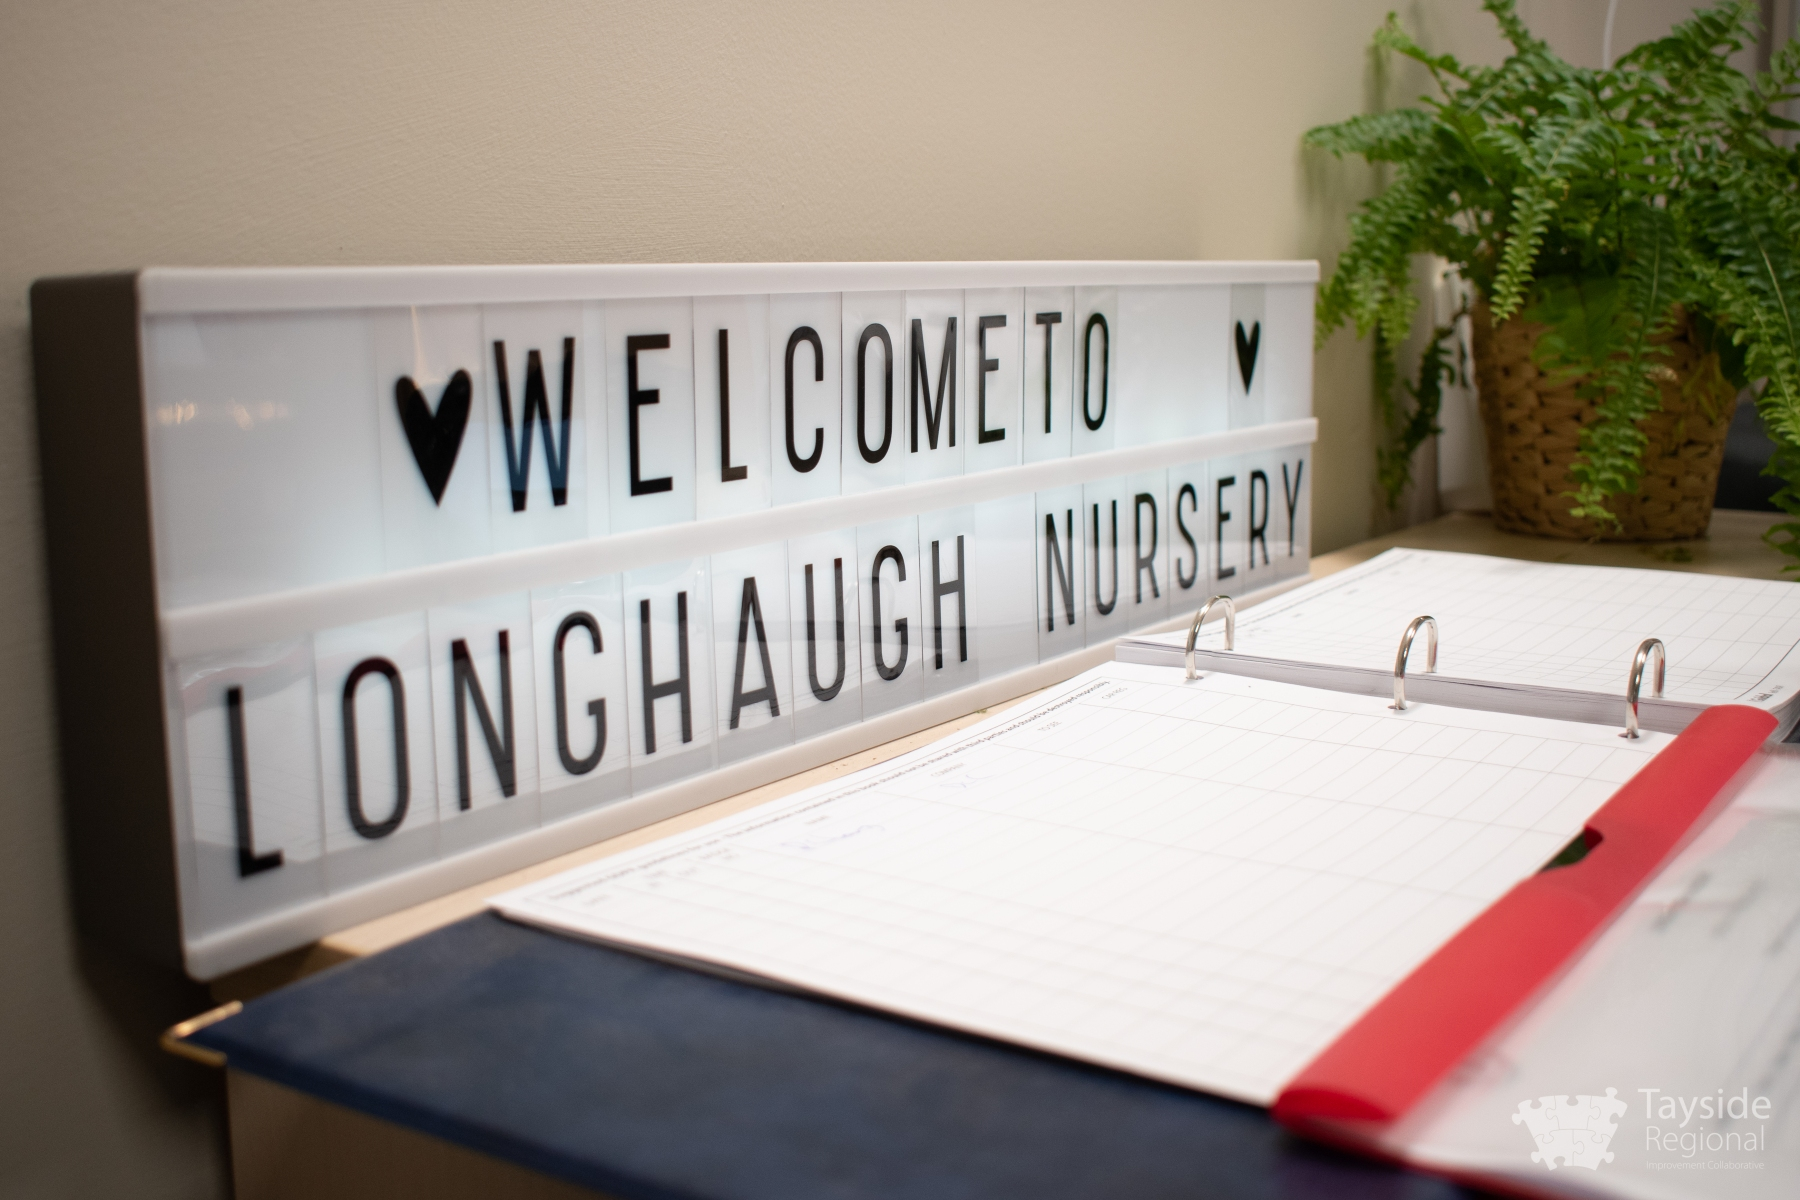 Longhaugh-Nursery-Dundee_001